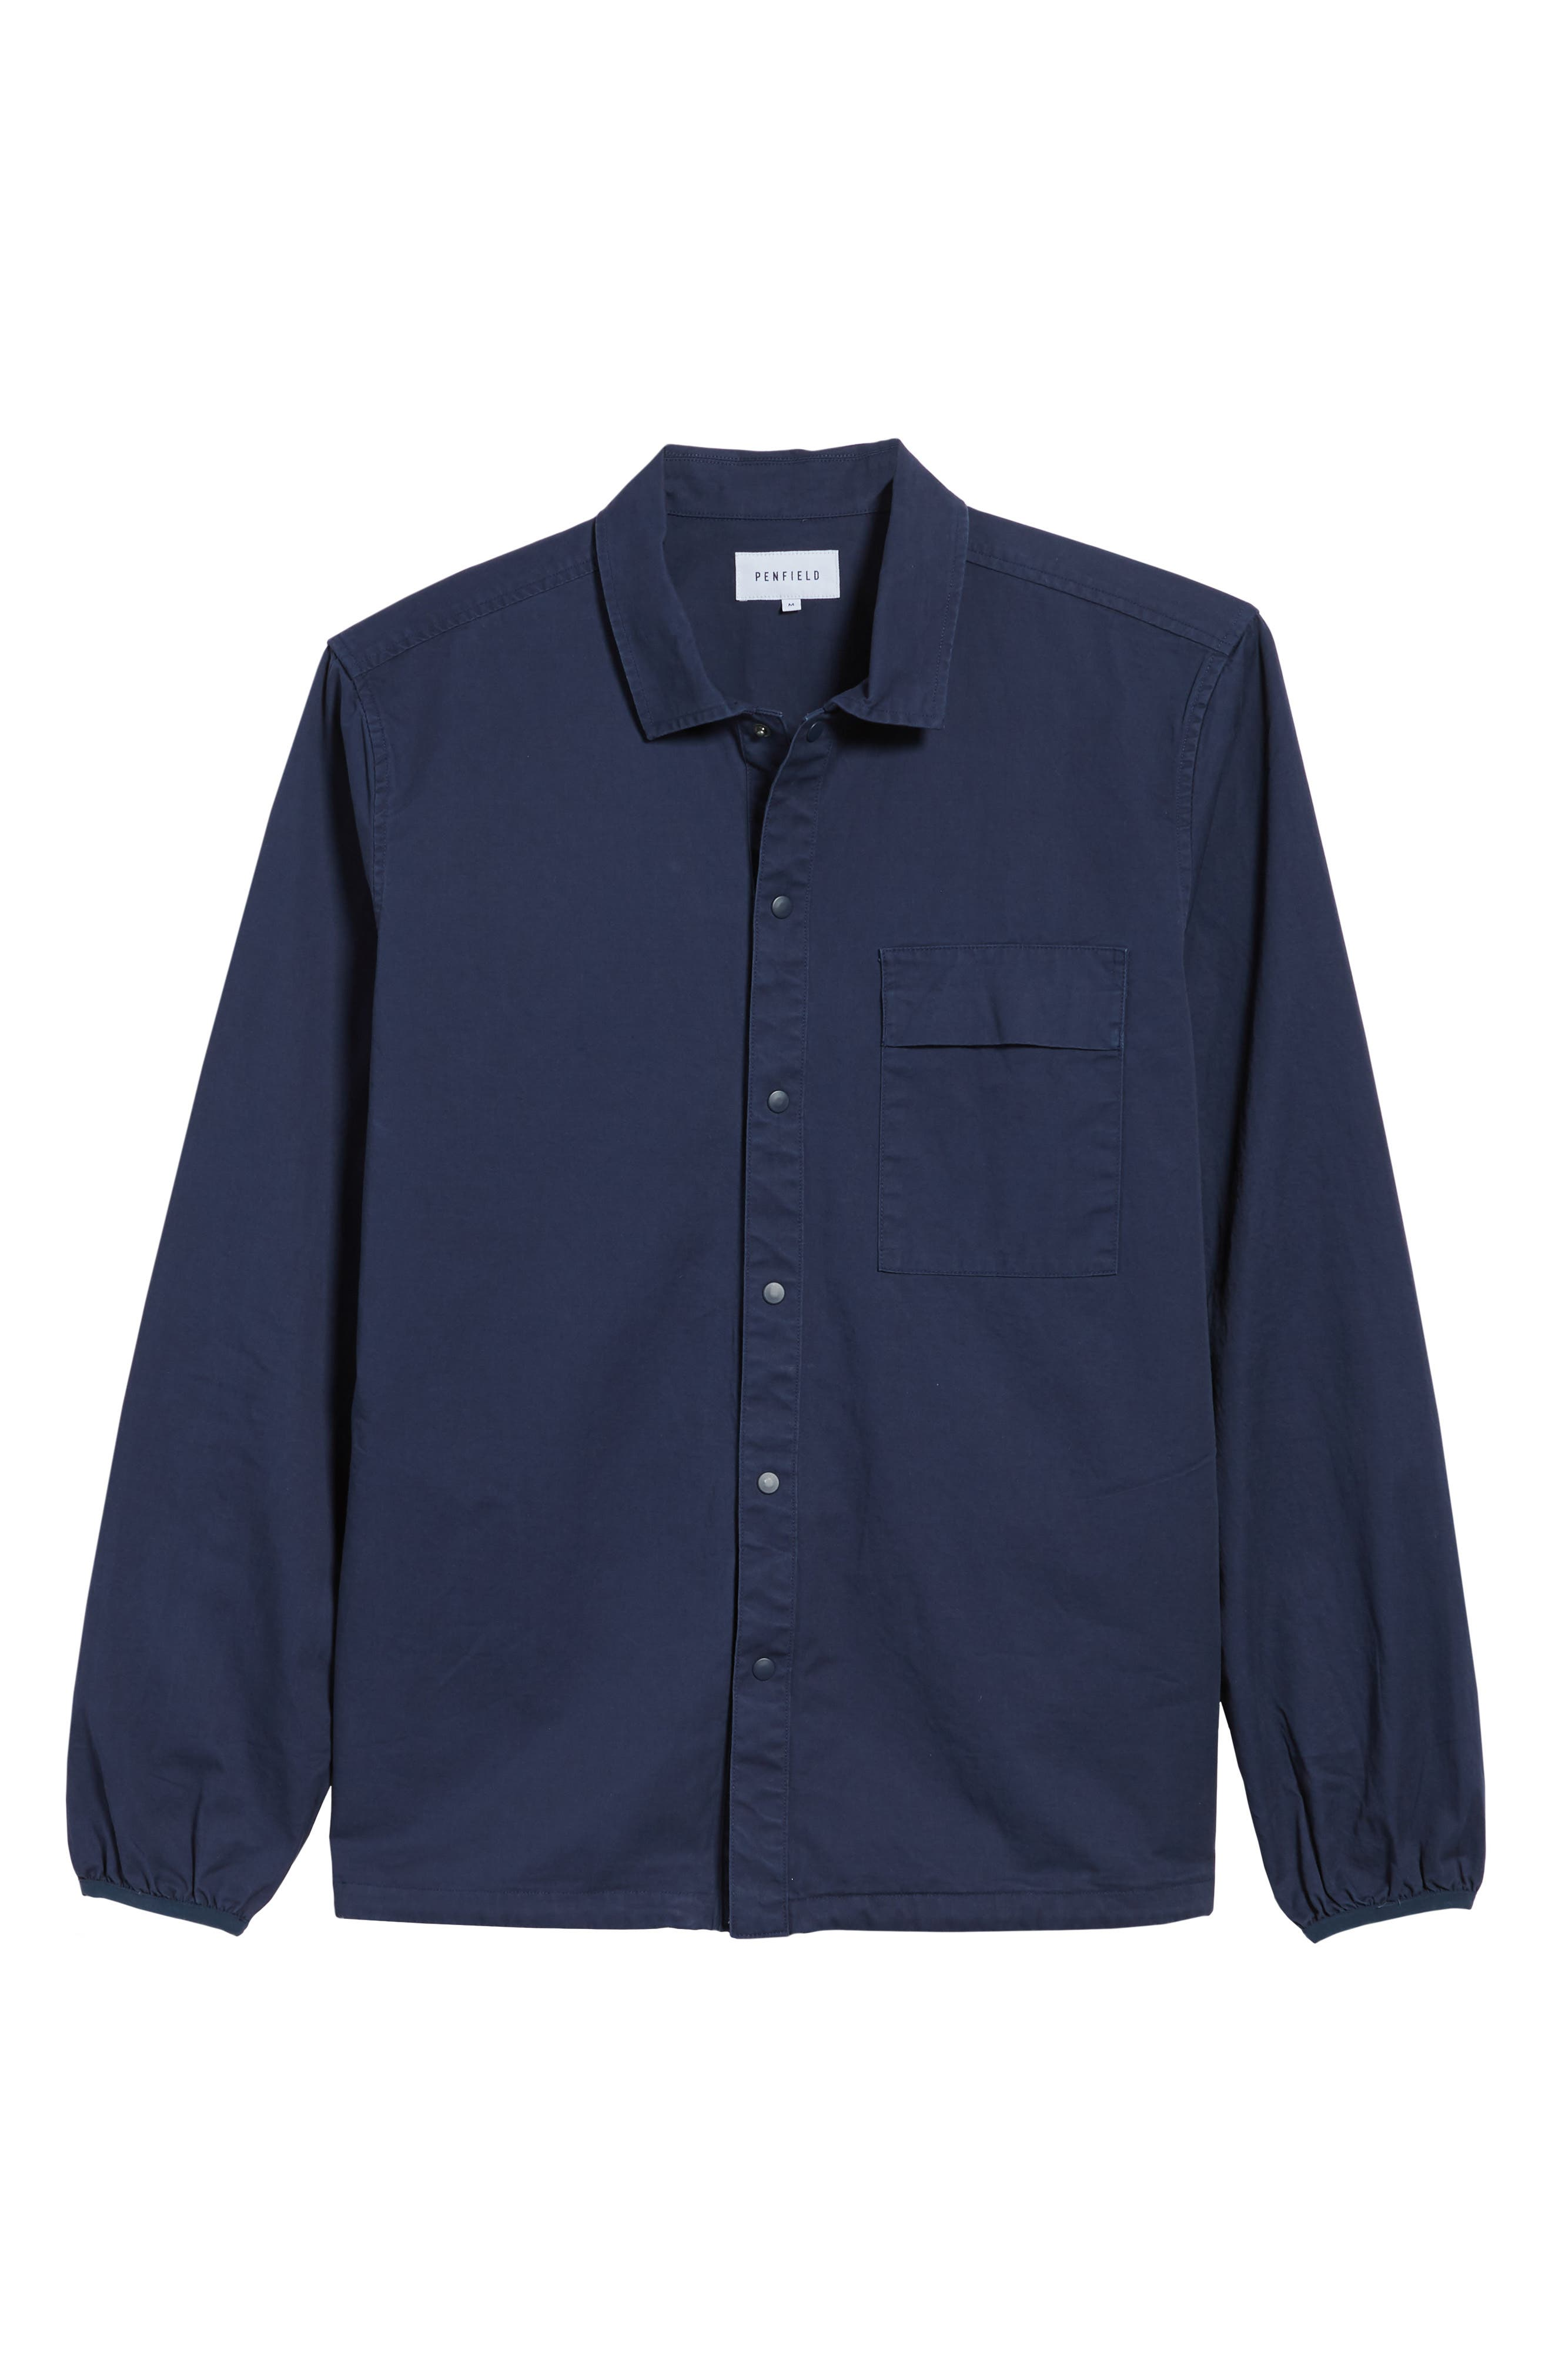 Blackstone Shirt Jacket,                             Alternate thumbnail 6, color,                             Navy